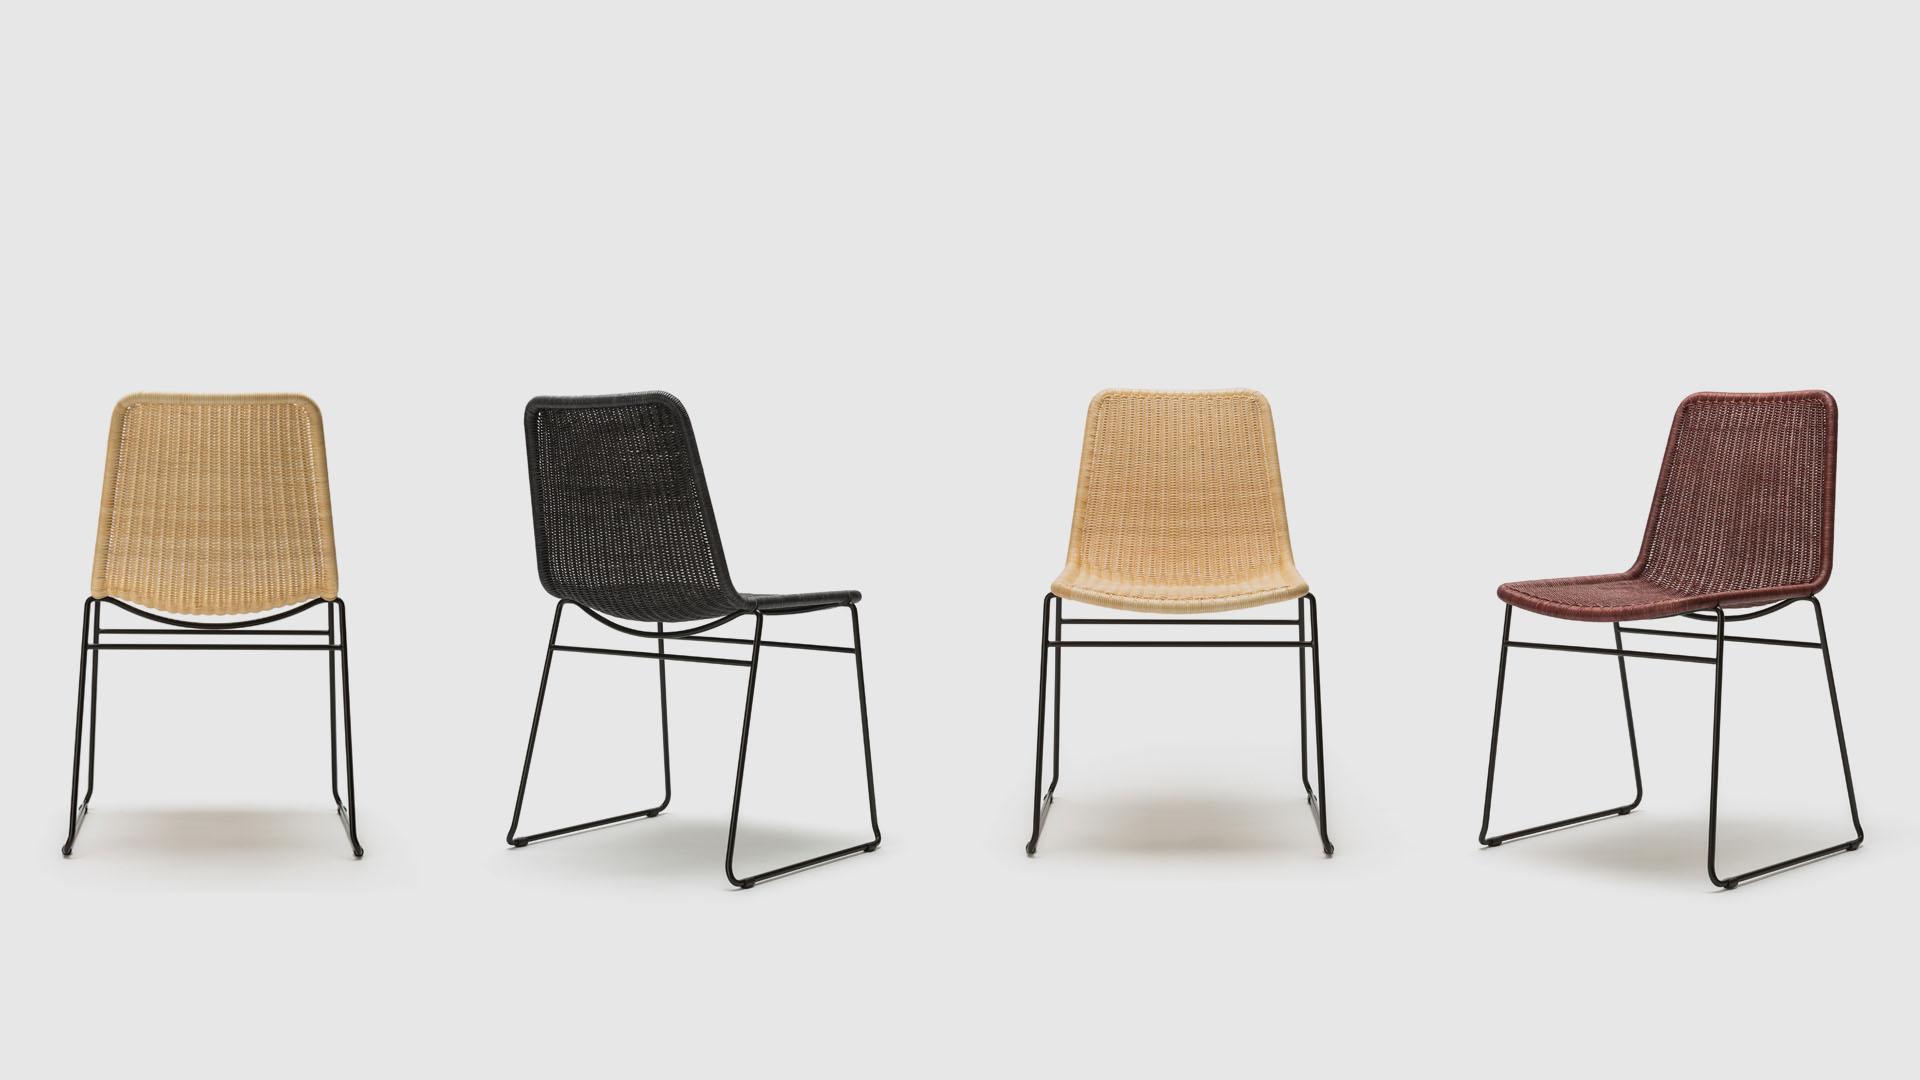 C607_chair_Yuzuru_Yamakawa_S3.jpg